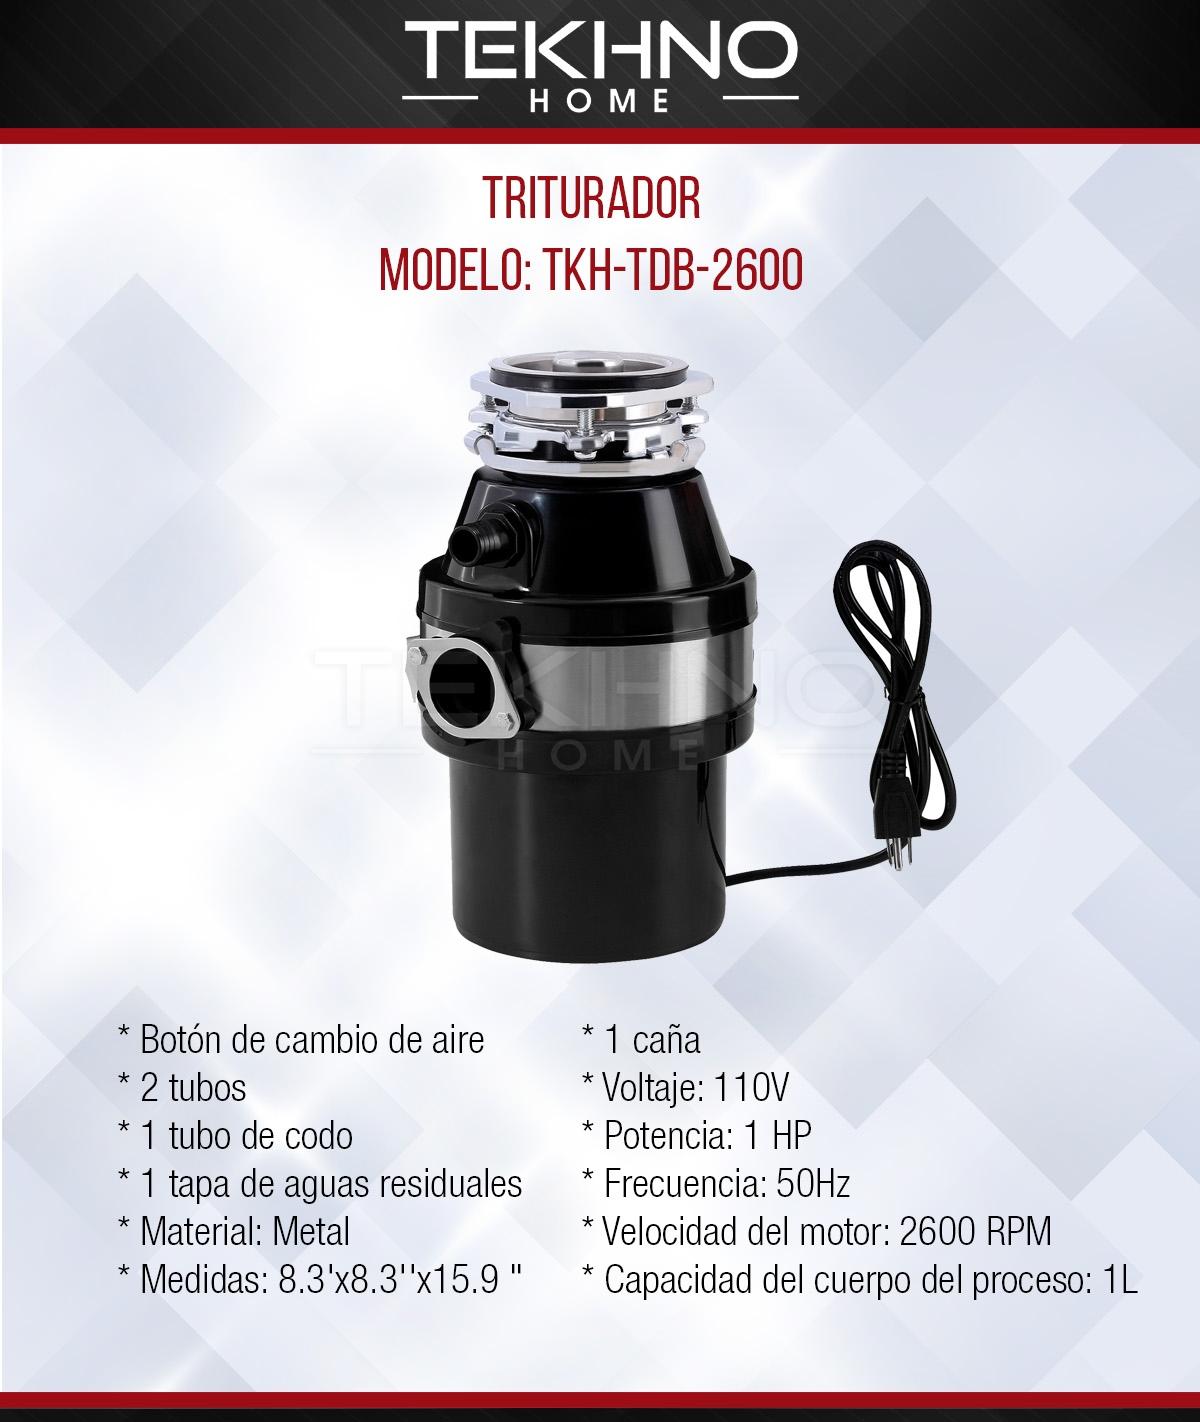 TRITURADOR TKH-TDB-2600